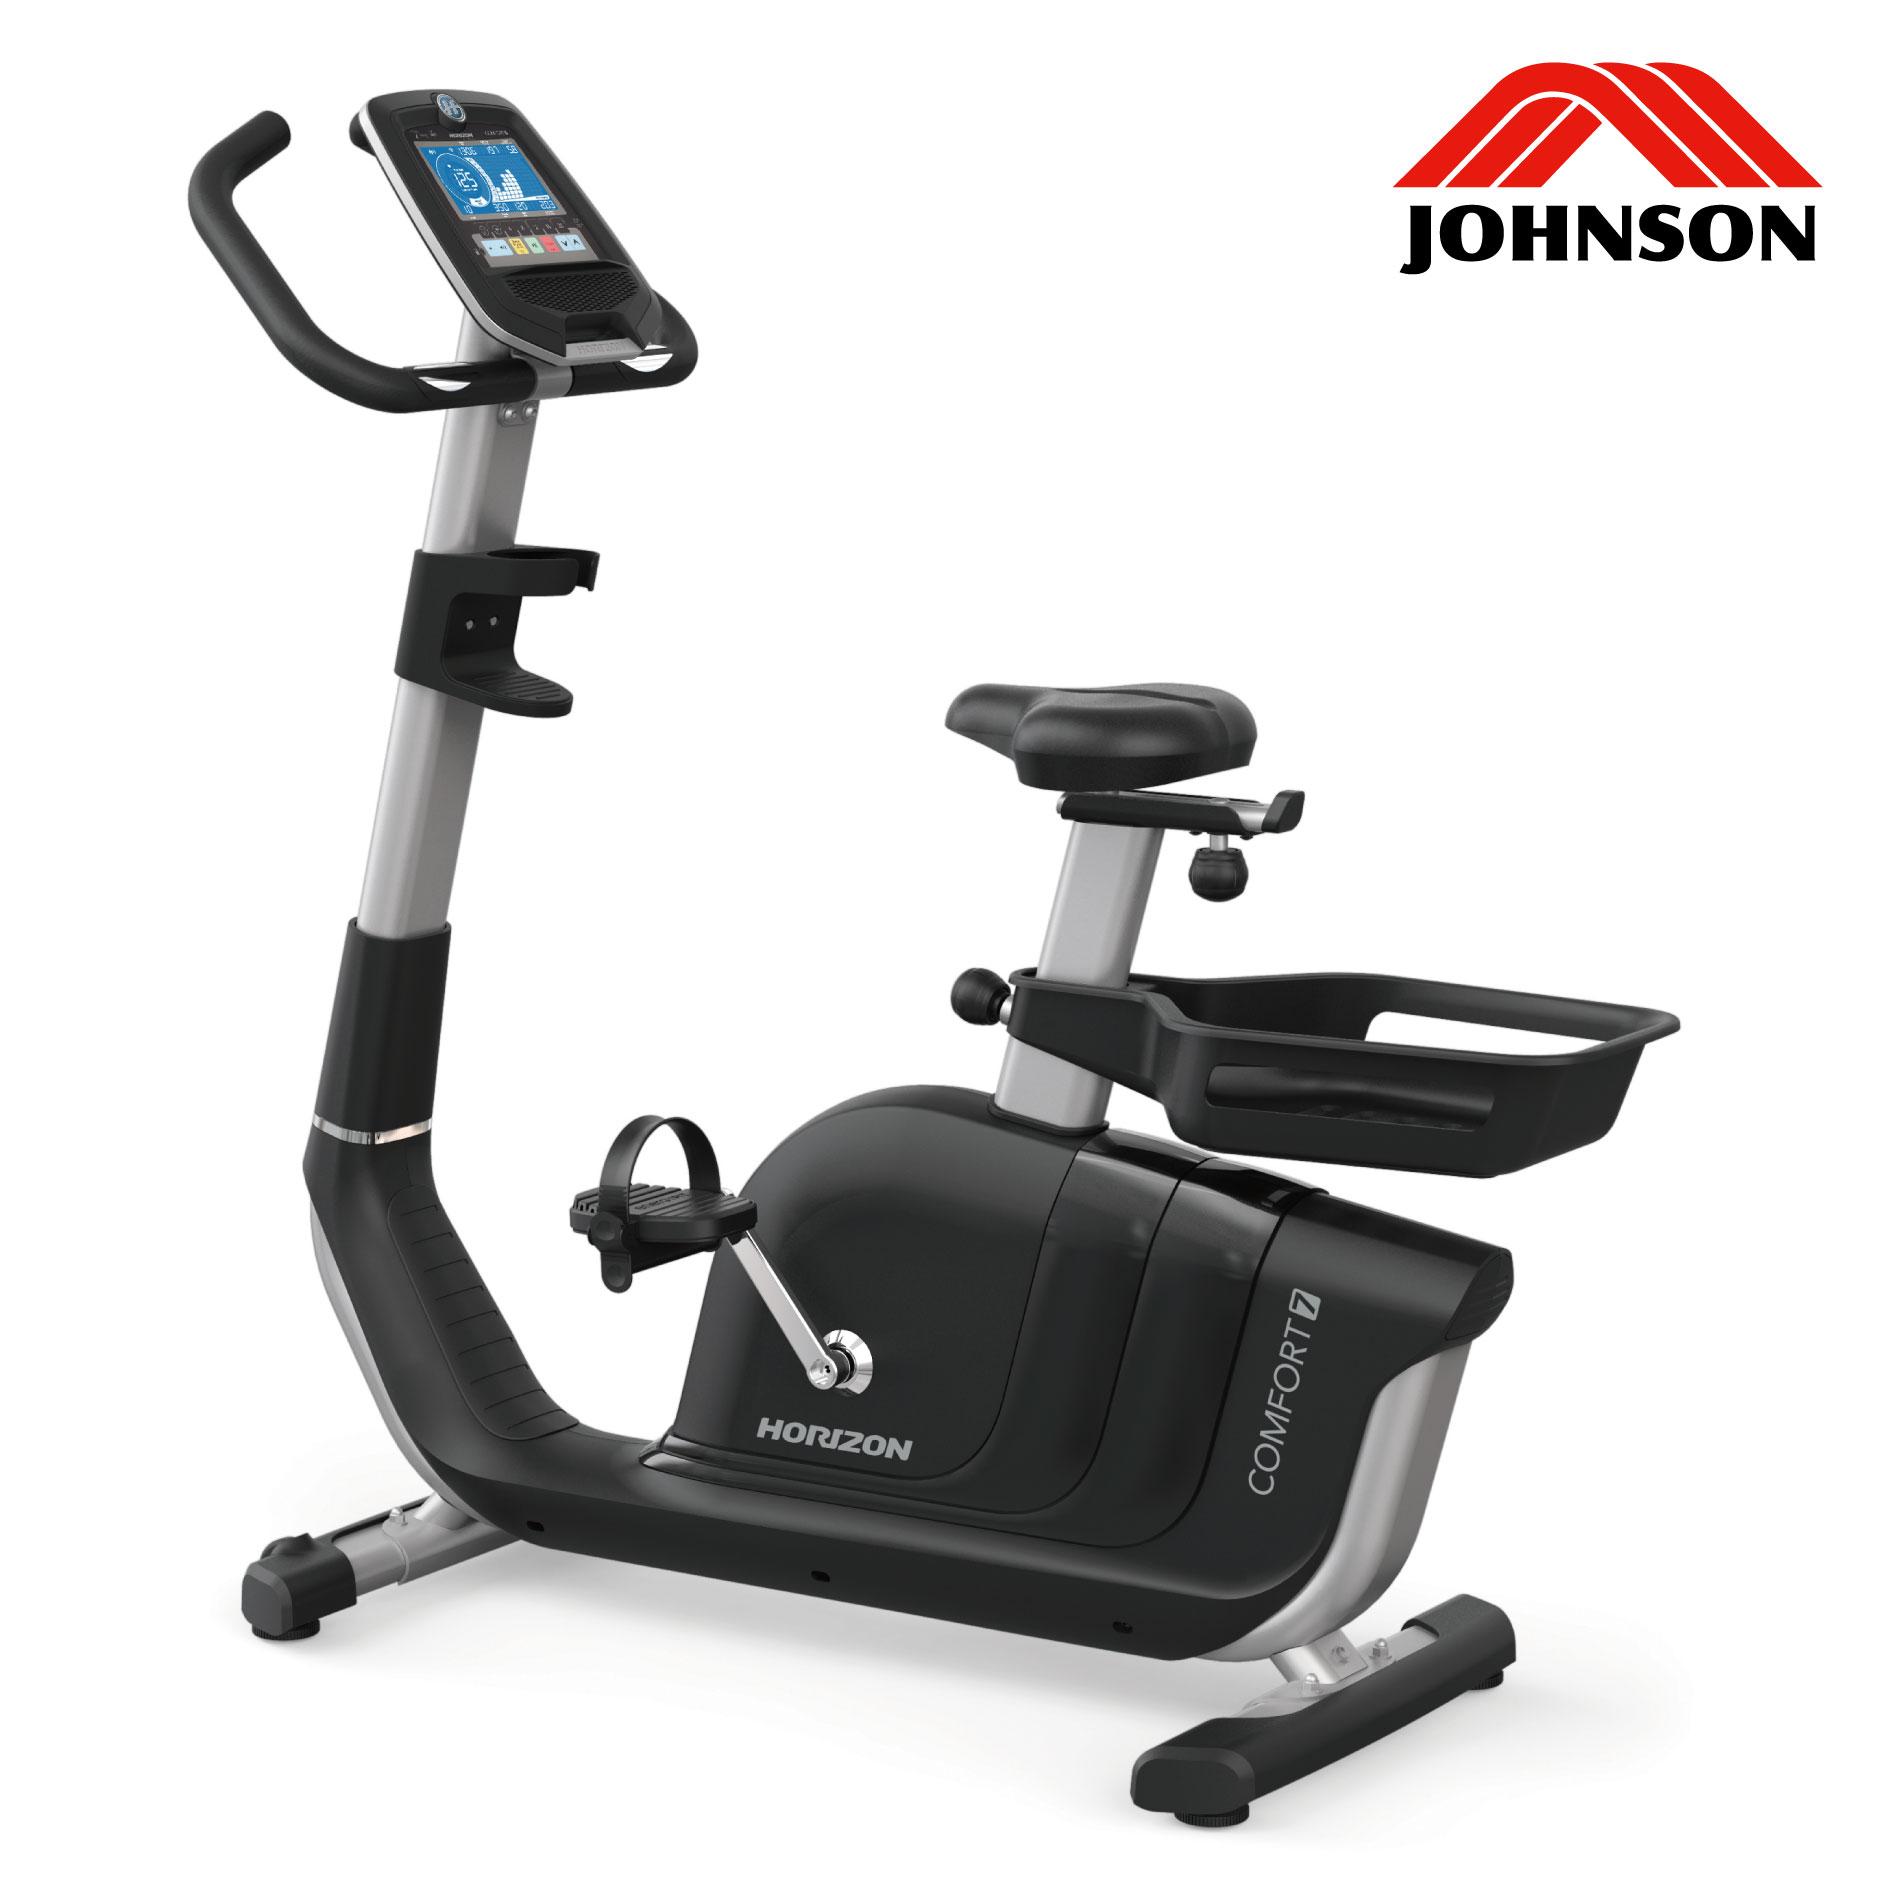 Comfort7/家庭用アップライトバイク《ジョンソンヘルステック》